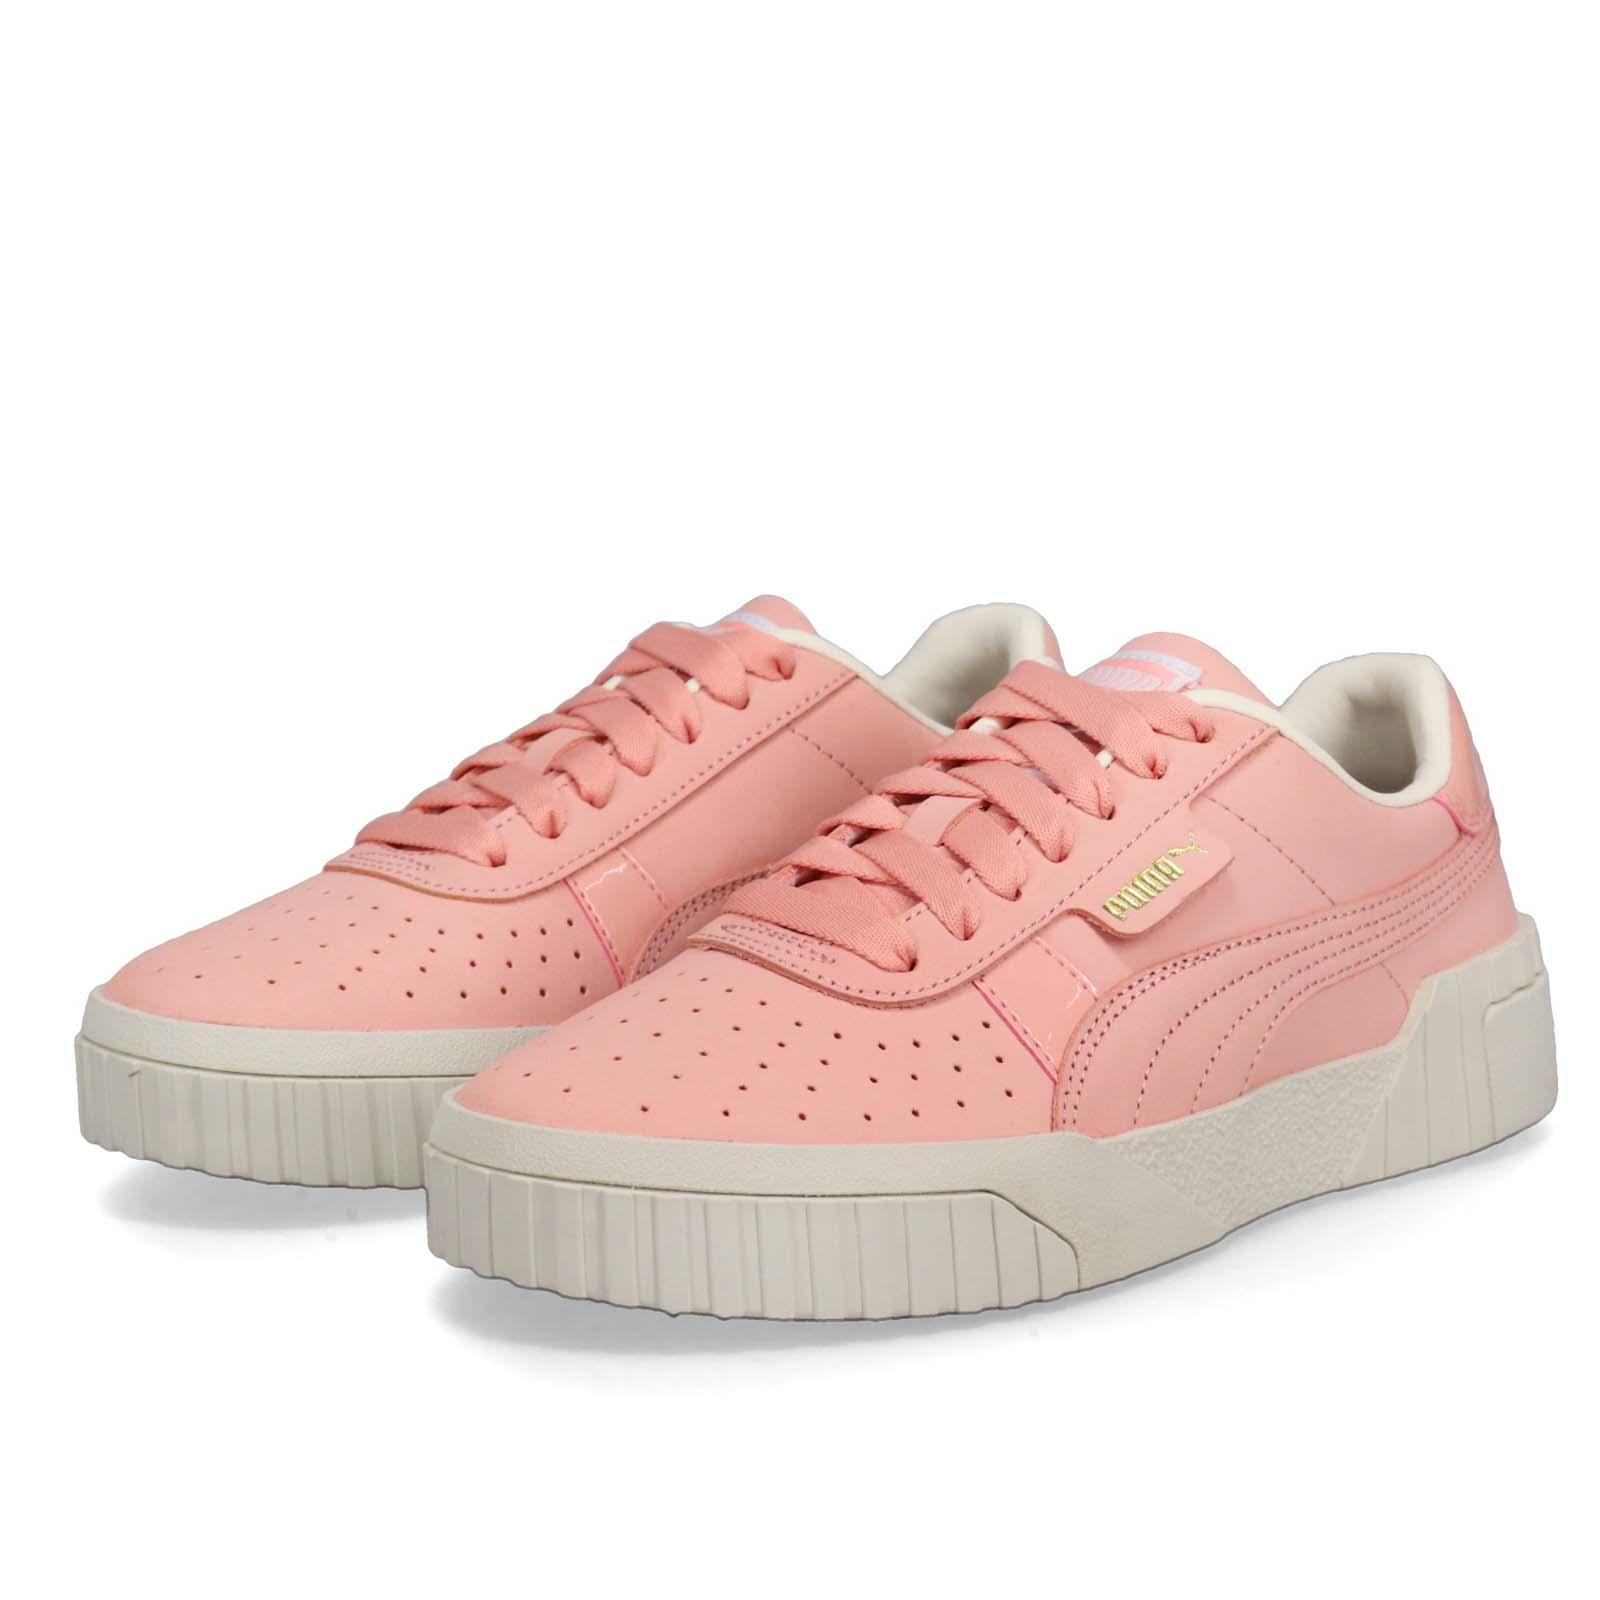 Puma 休閒鞋 Cali Nubuck 運動 女鞋 36916101